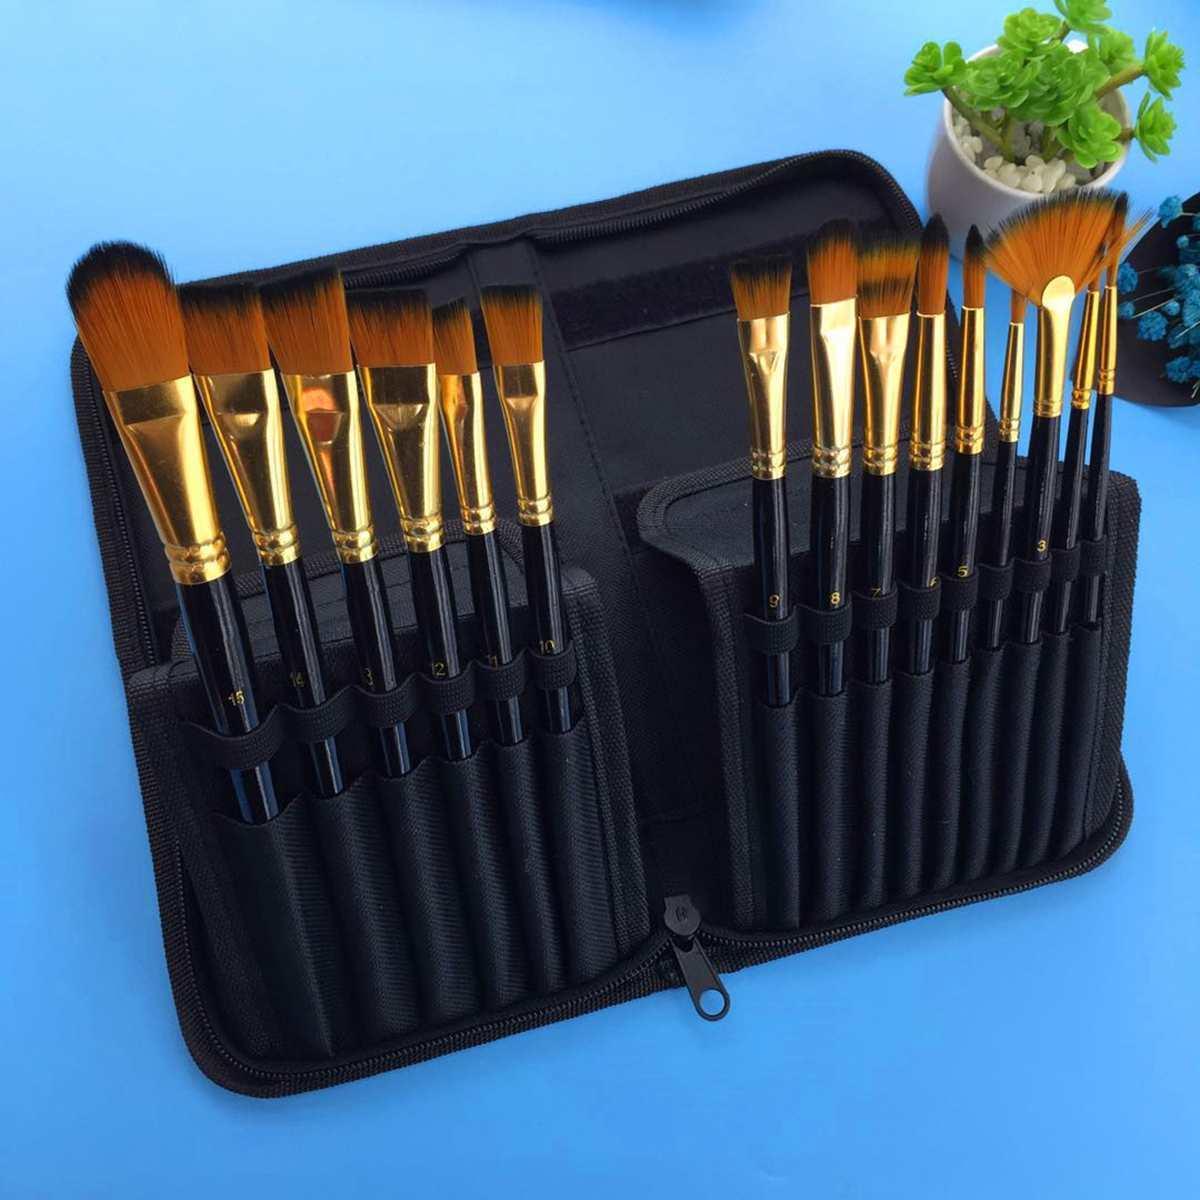 Paint Brushes Set Nylon Hair Painting Brush Variety Style Short Rod Oil Acrylic Brush Watercolor Pen Art Supplies Y19061804